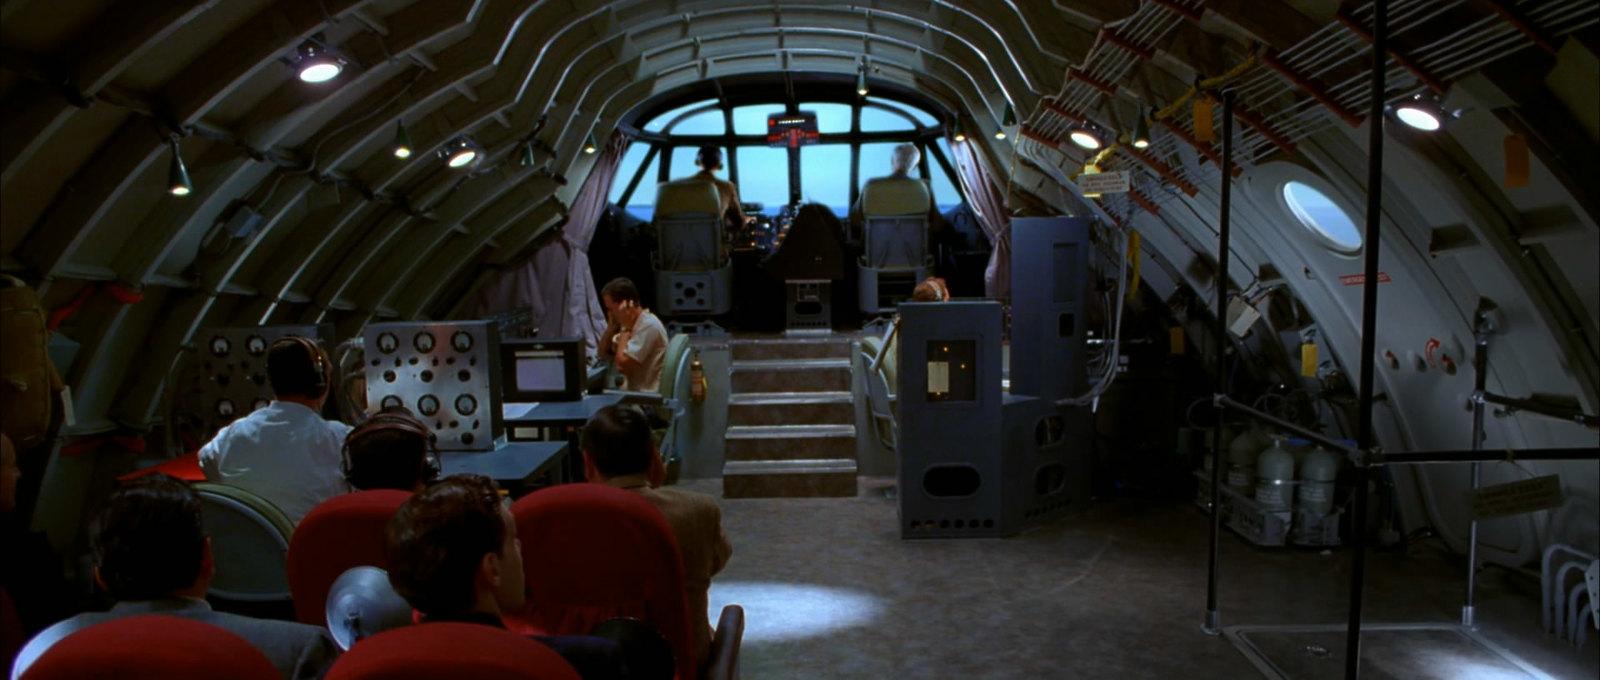 The.Aviator.2004.1080p.BluRay.DTS.x264.CHD.Rus.Eng.mkv_snapshot_02.38.14_[2014.05.29_14.43.18]